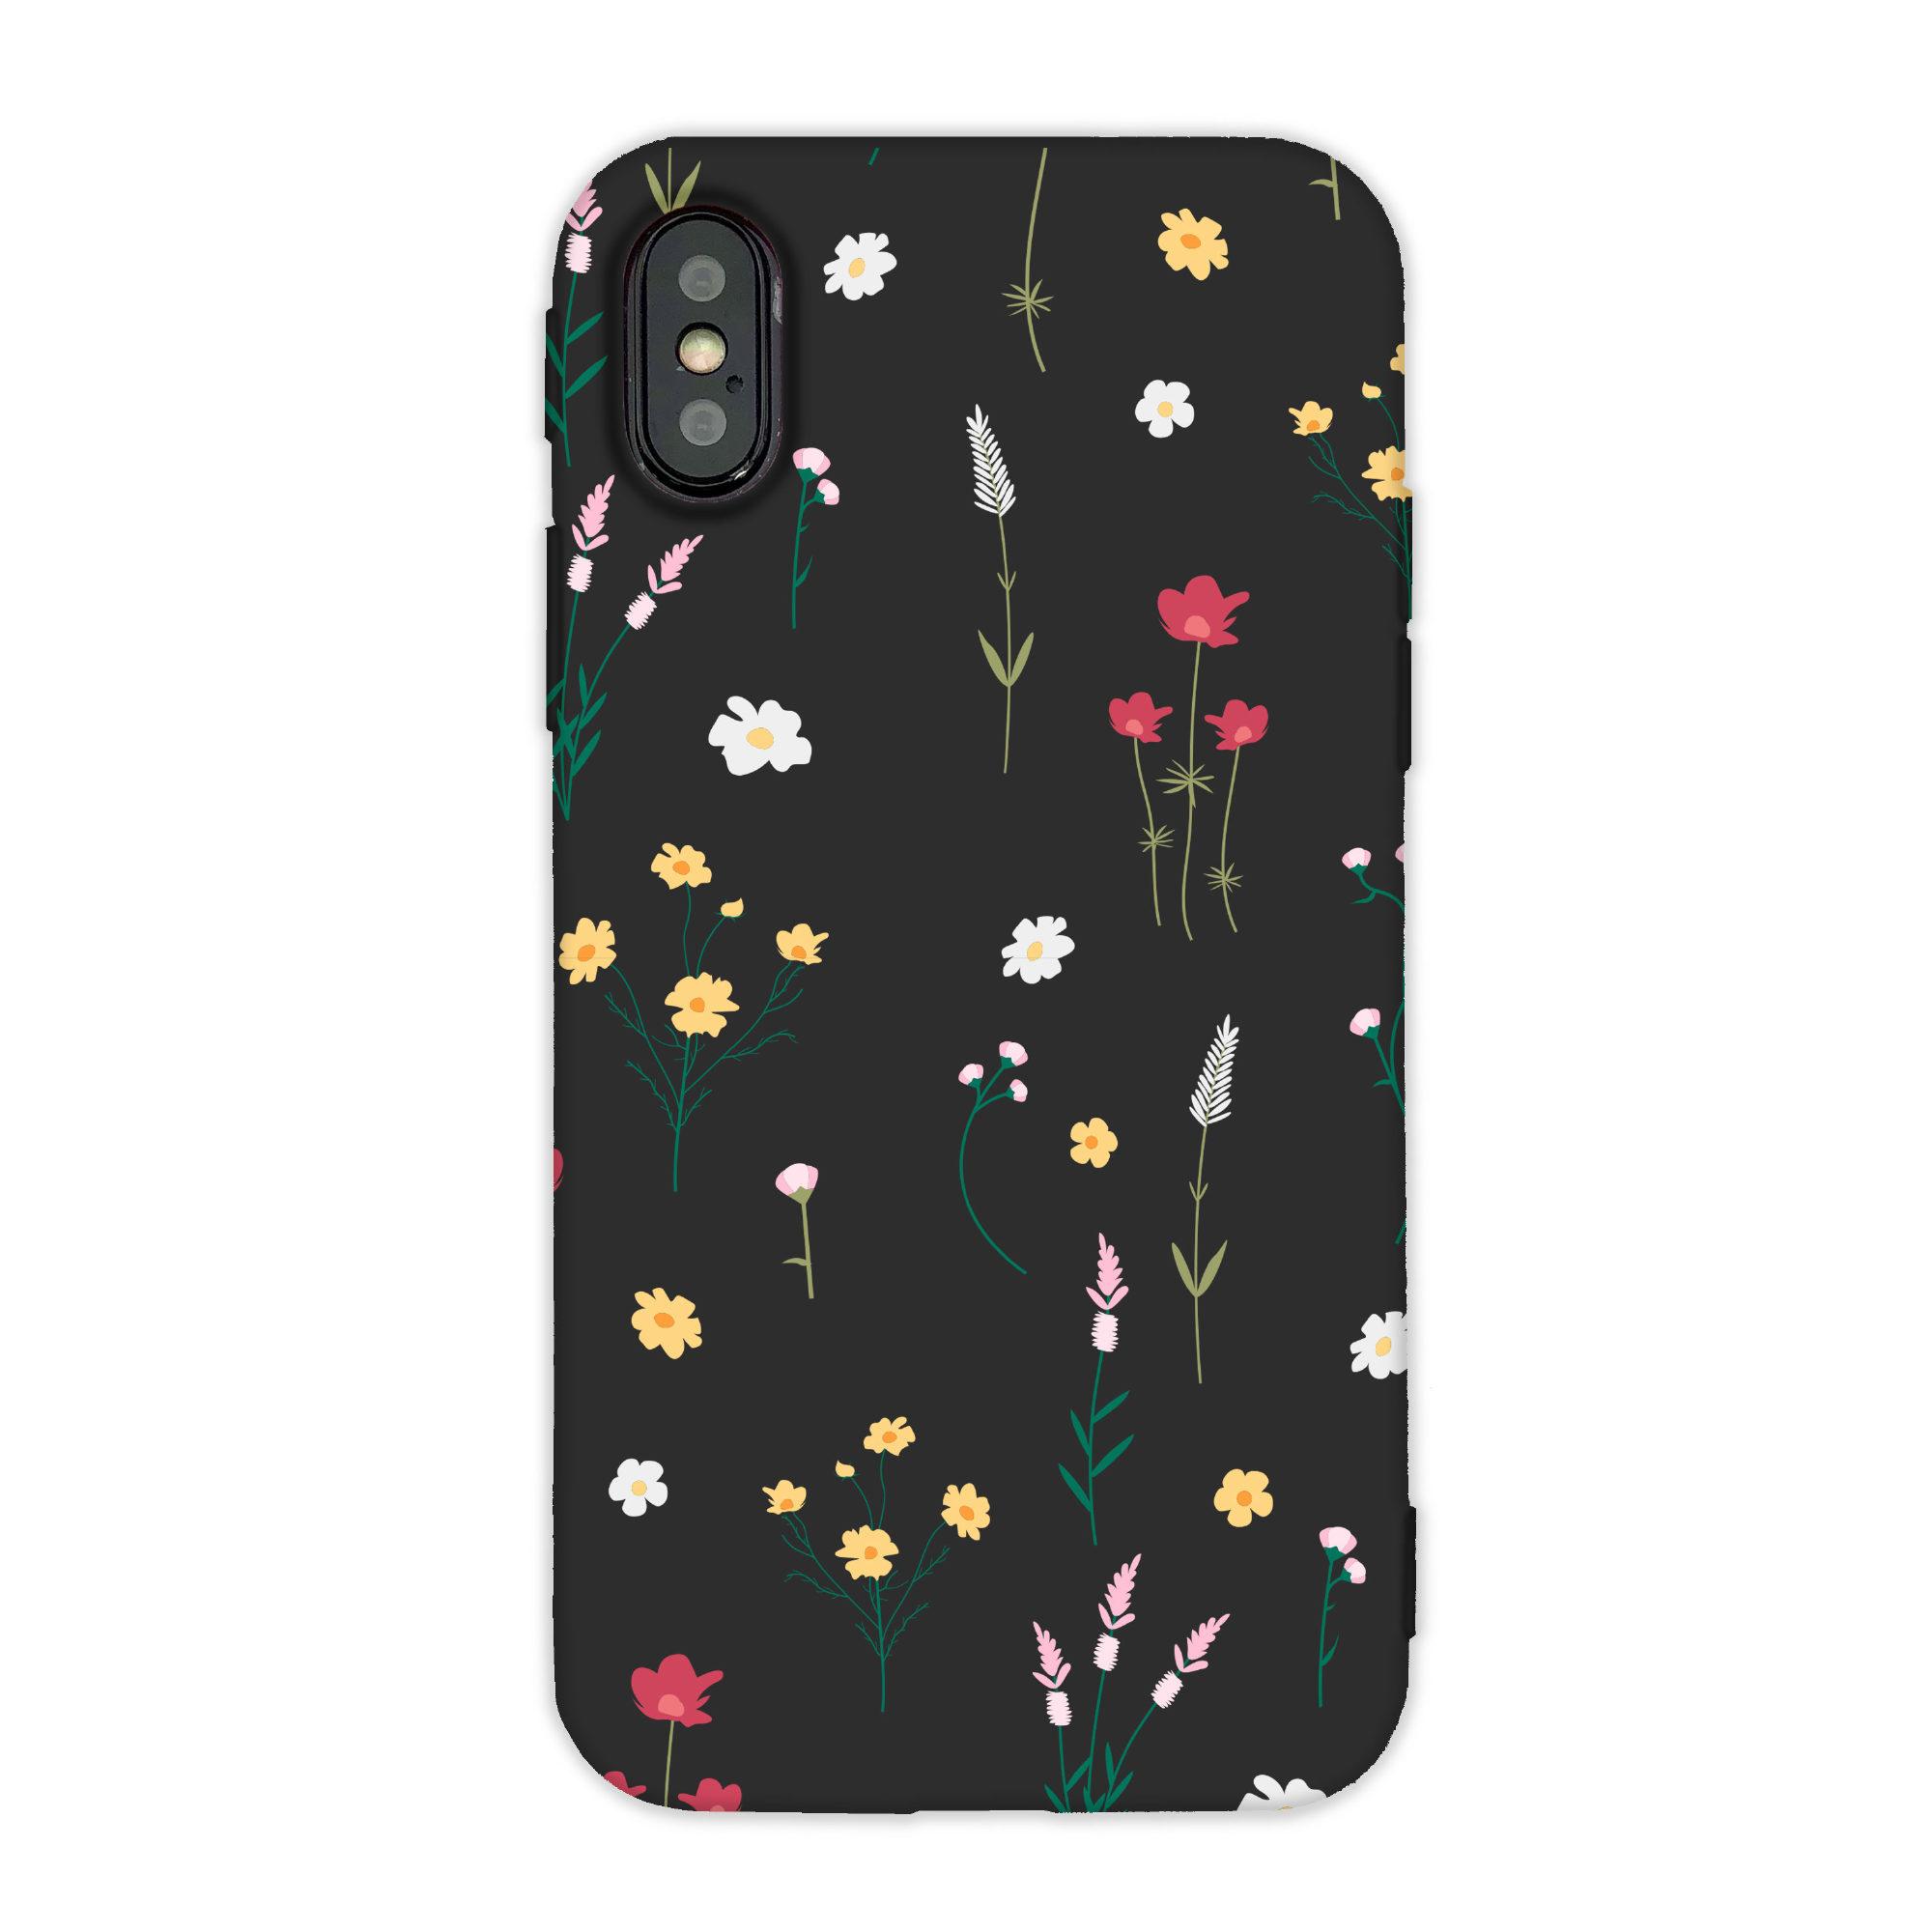 Small Daisy小雛菊碎花iPhone手機殼